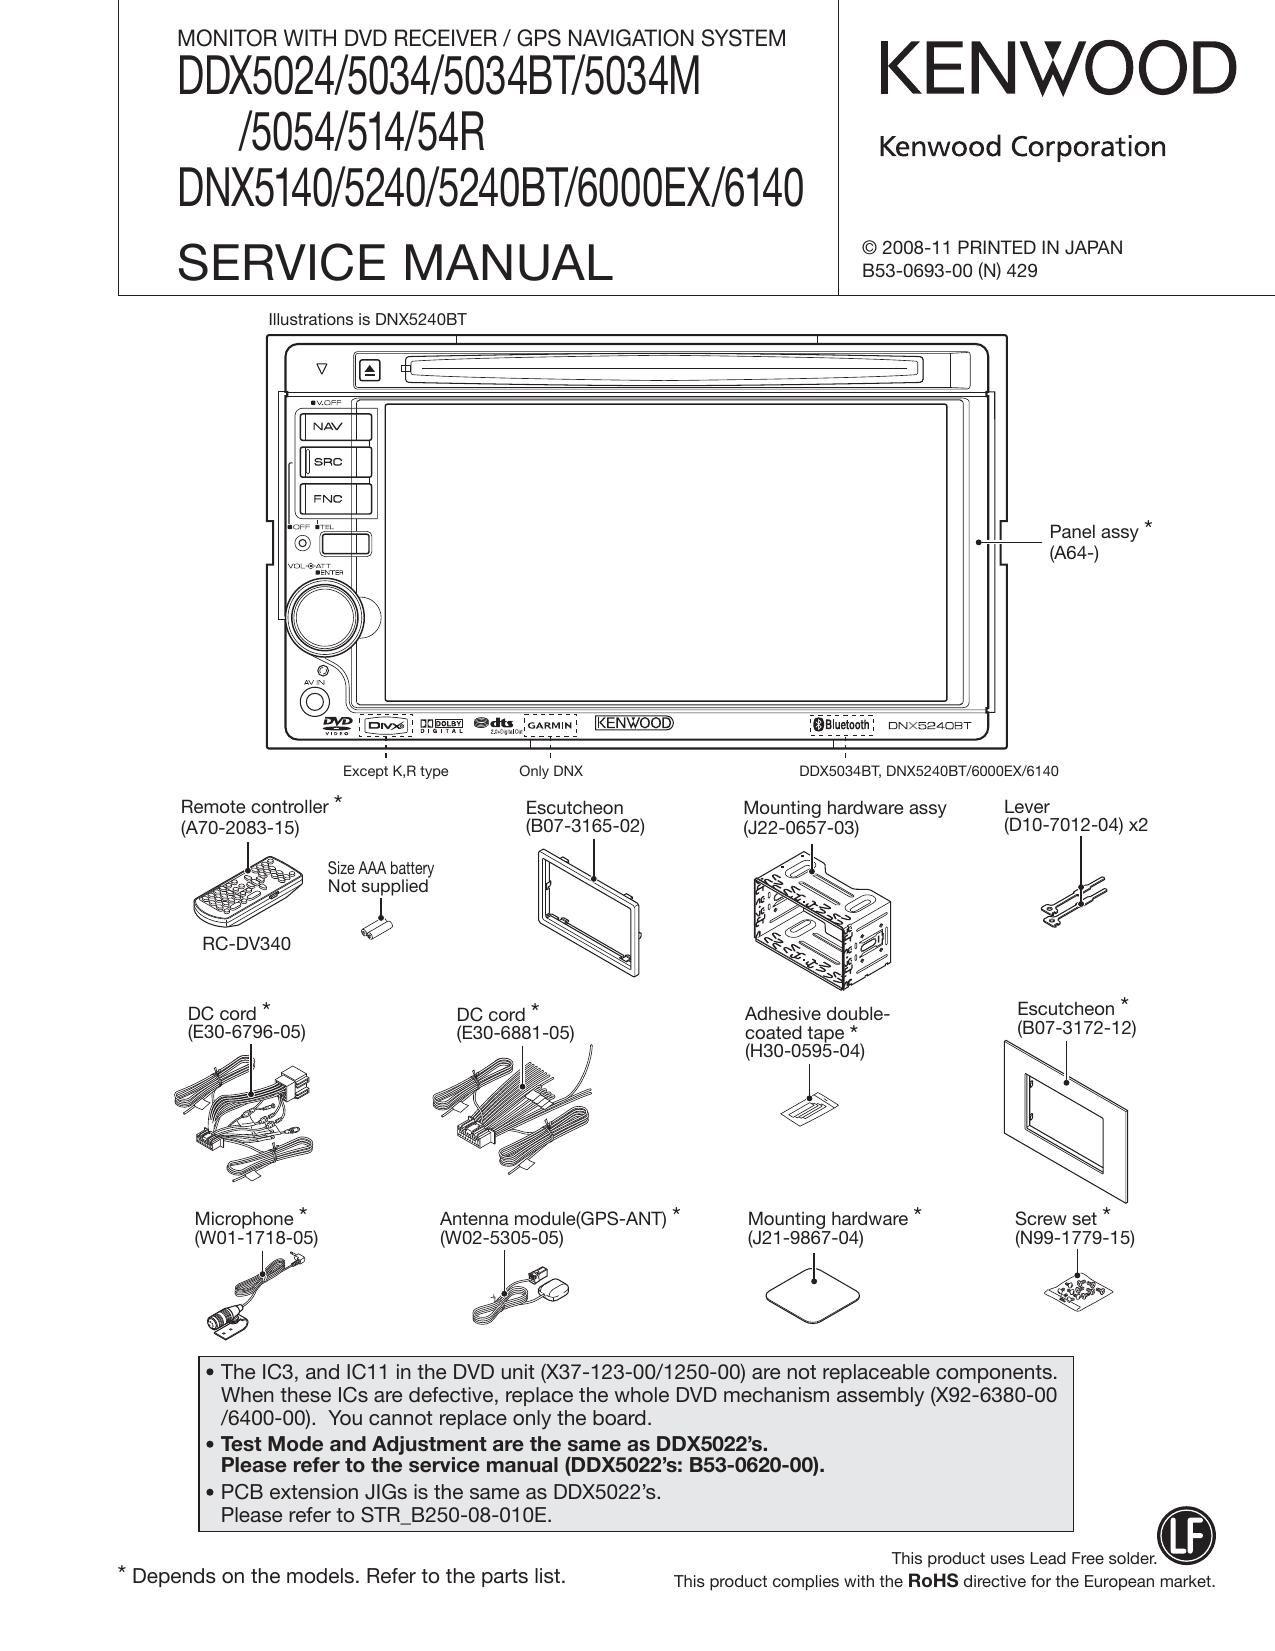 kenwood dnx 6140 service manual rh audioservicemanuals com Kenwood DNX6140 Manual kenwood dnx5140 installation manual